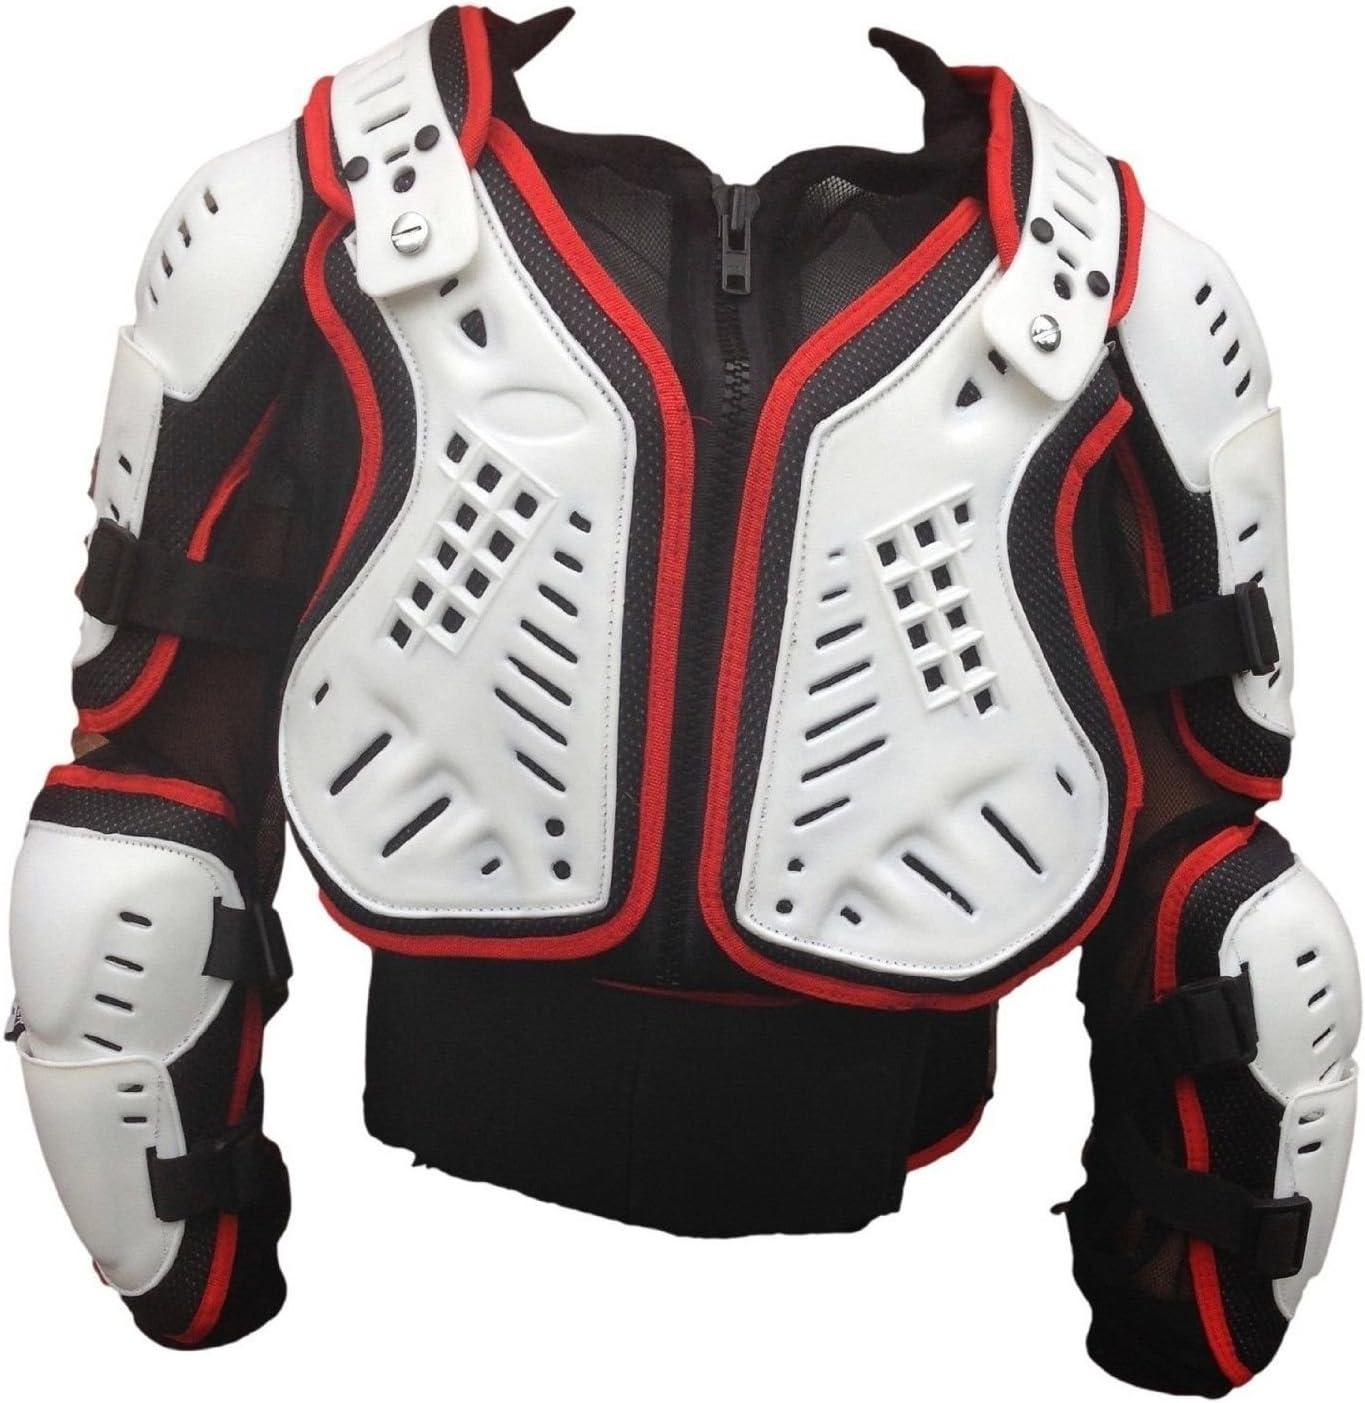 XTRM bambini motocross approvato pieno petto Body Armour bianco rosso